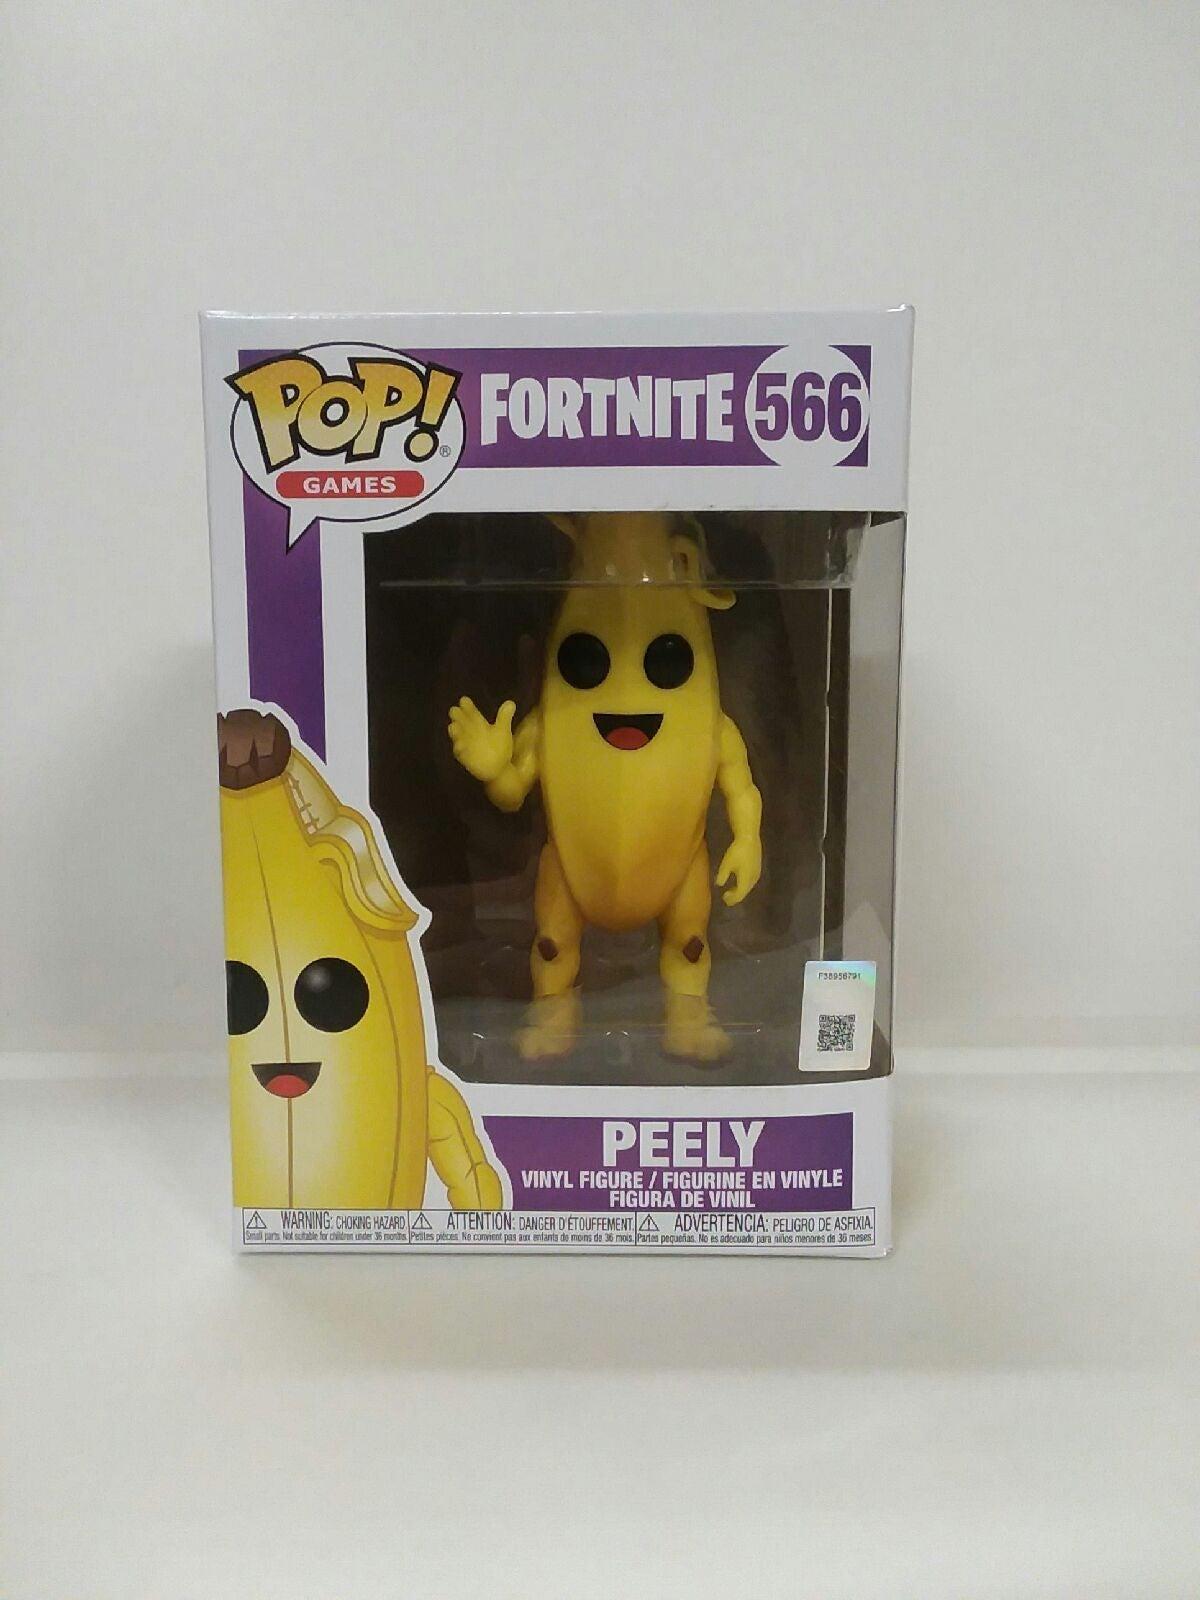 PEELY - Fortnite Funko Pop #566